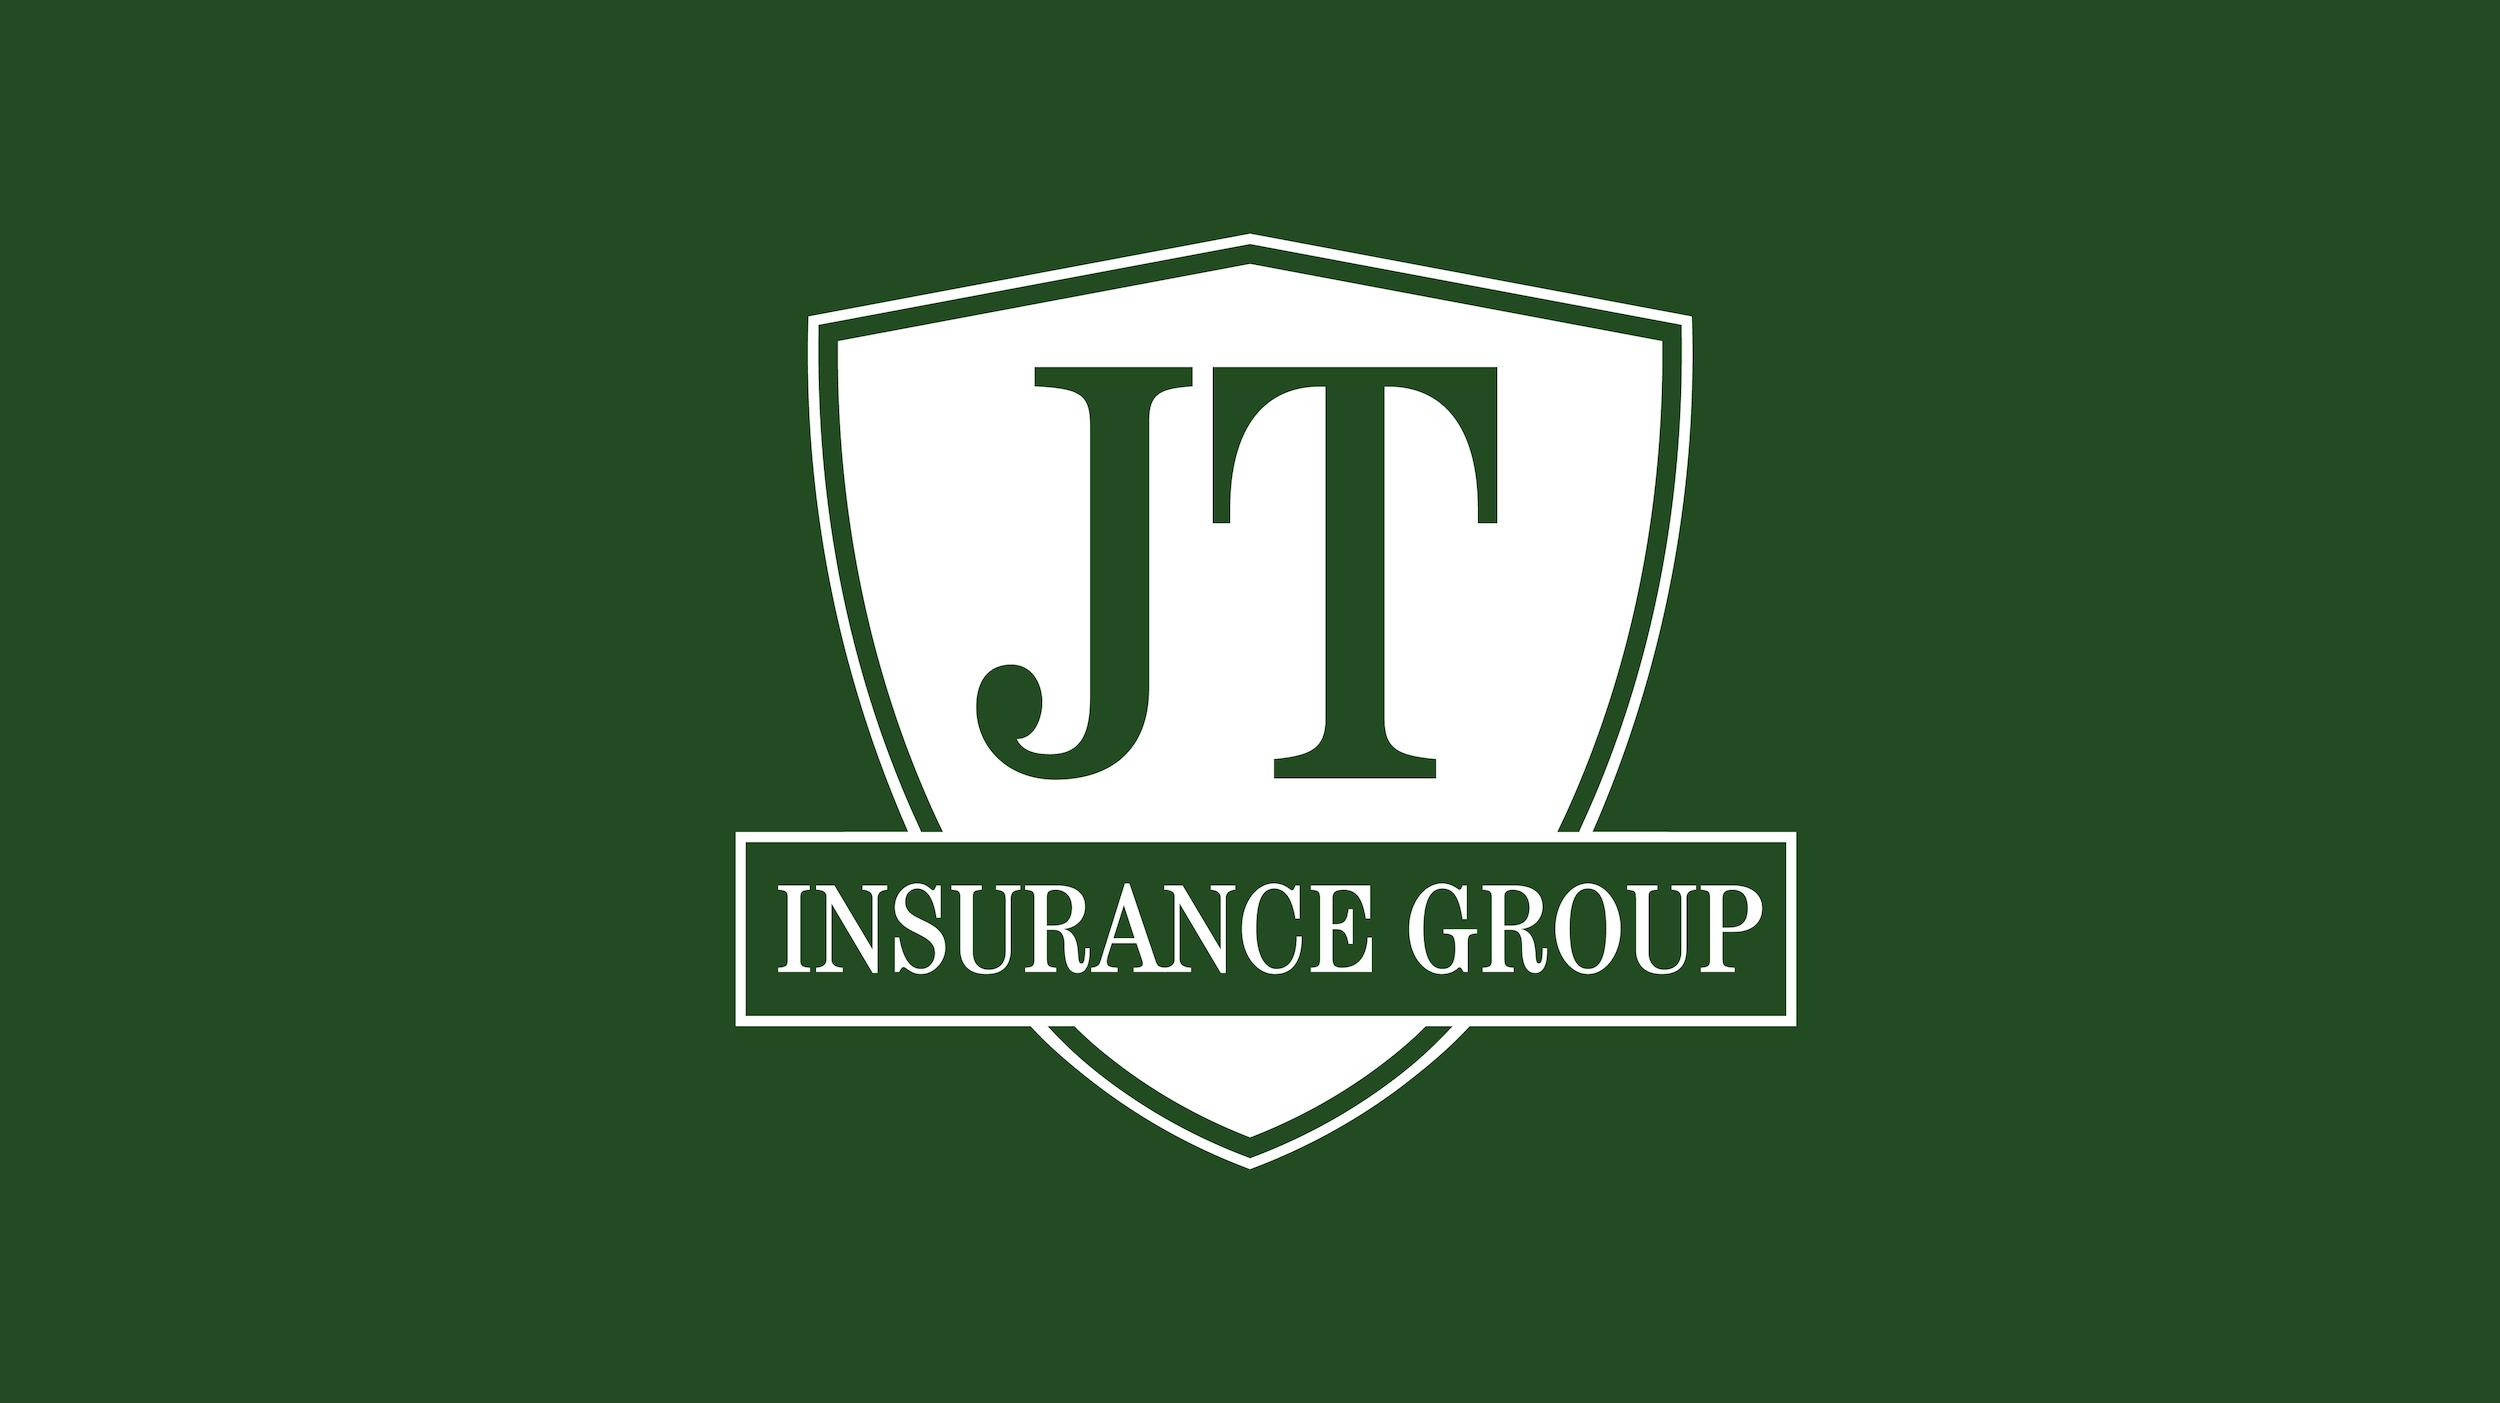 JT Insurance Group